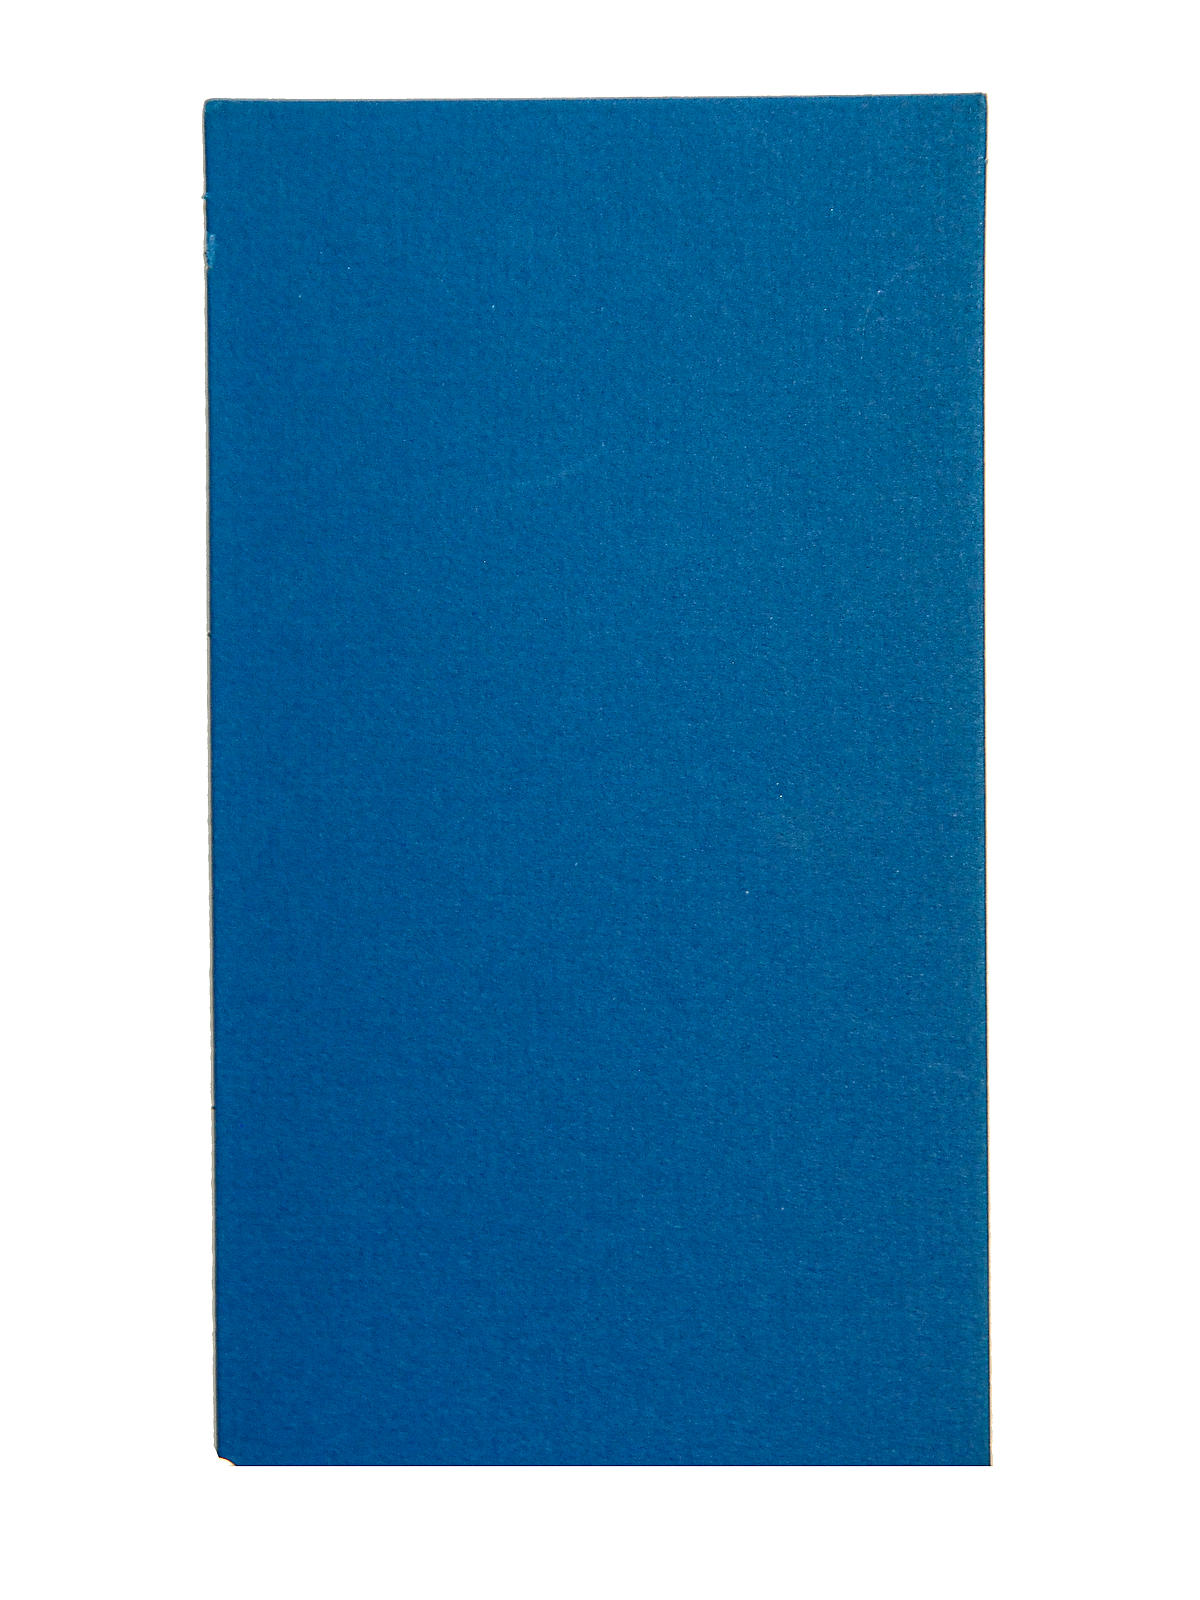 Crescent berkshire mat board misterart berkshire mat board blue 32 in x 40 in cream core geenschuldenfo Images